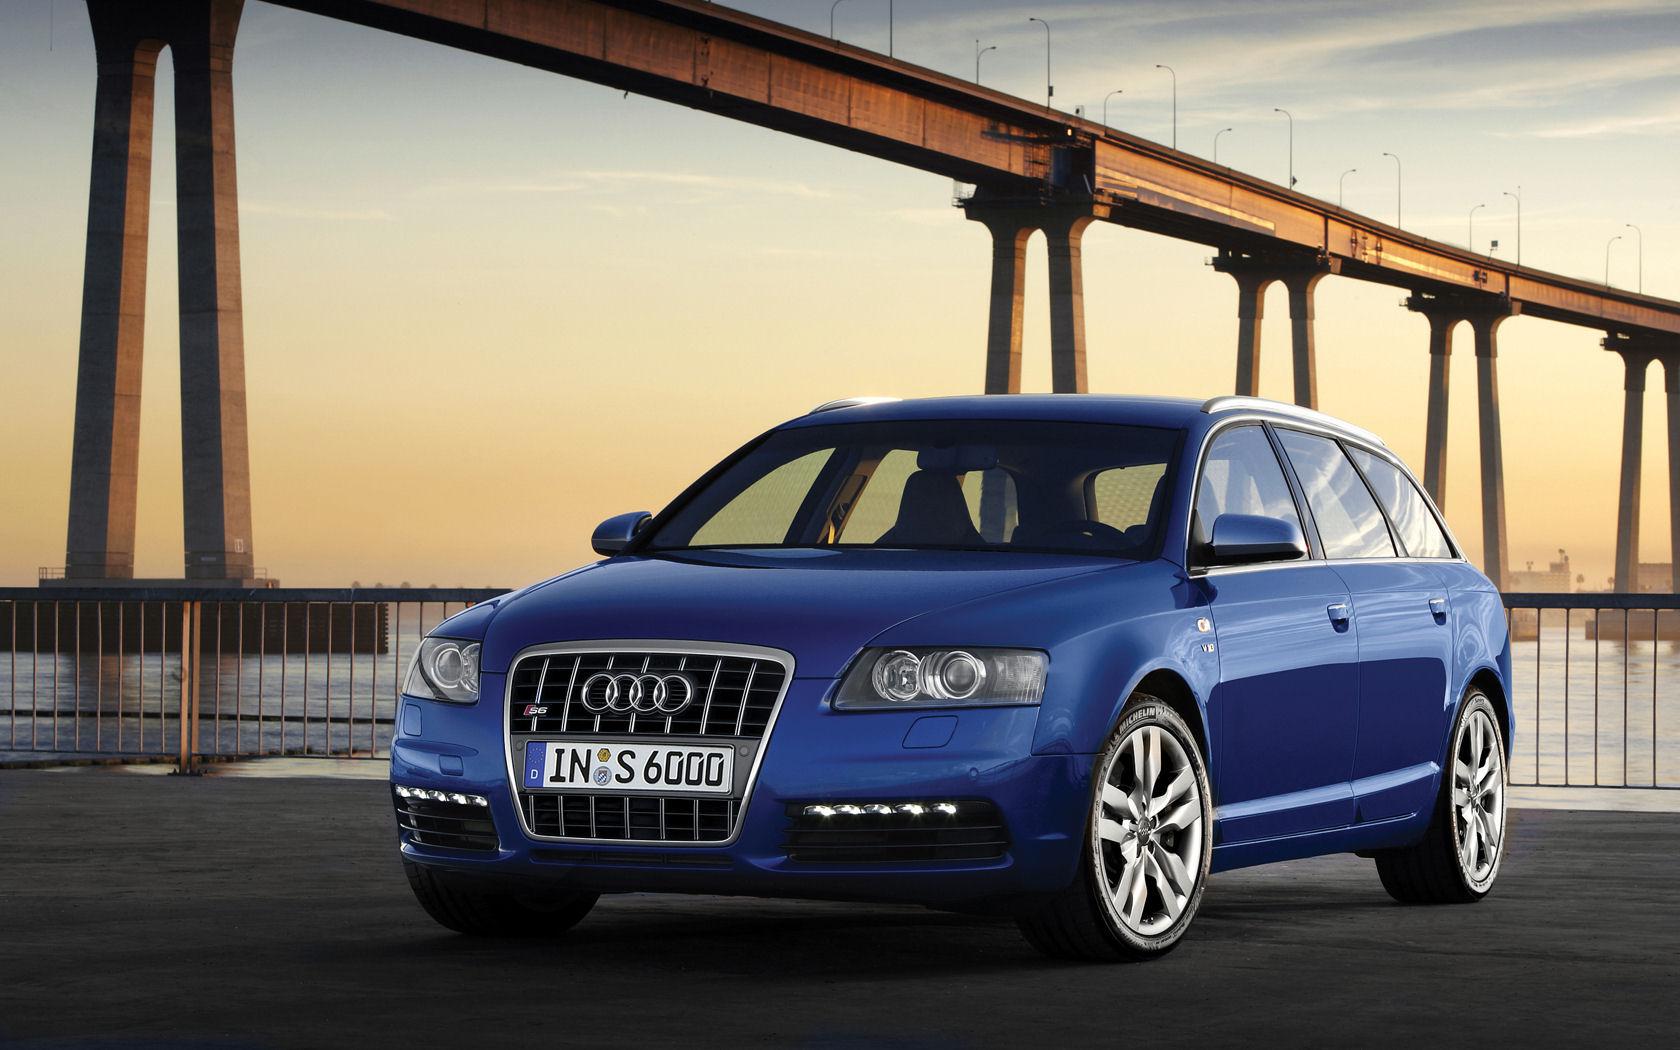 Audi奥迪S6旅行车 1680x1050 桌面壁纸 壁纸大卡 壁纸桌高清图片